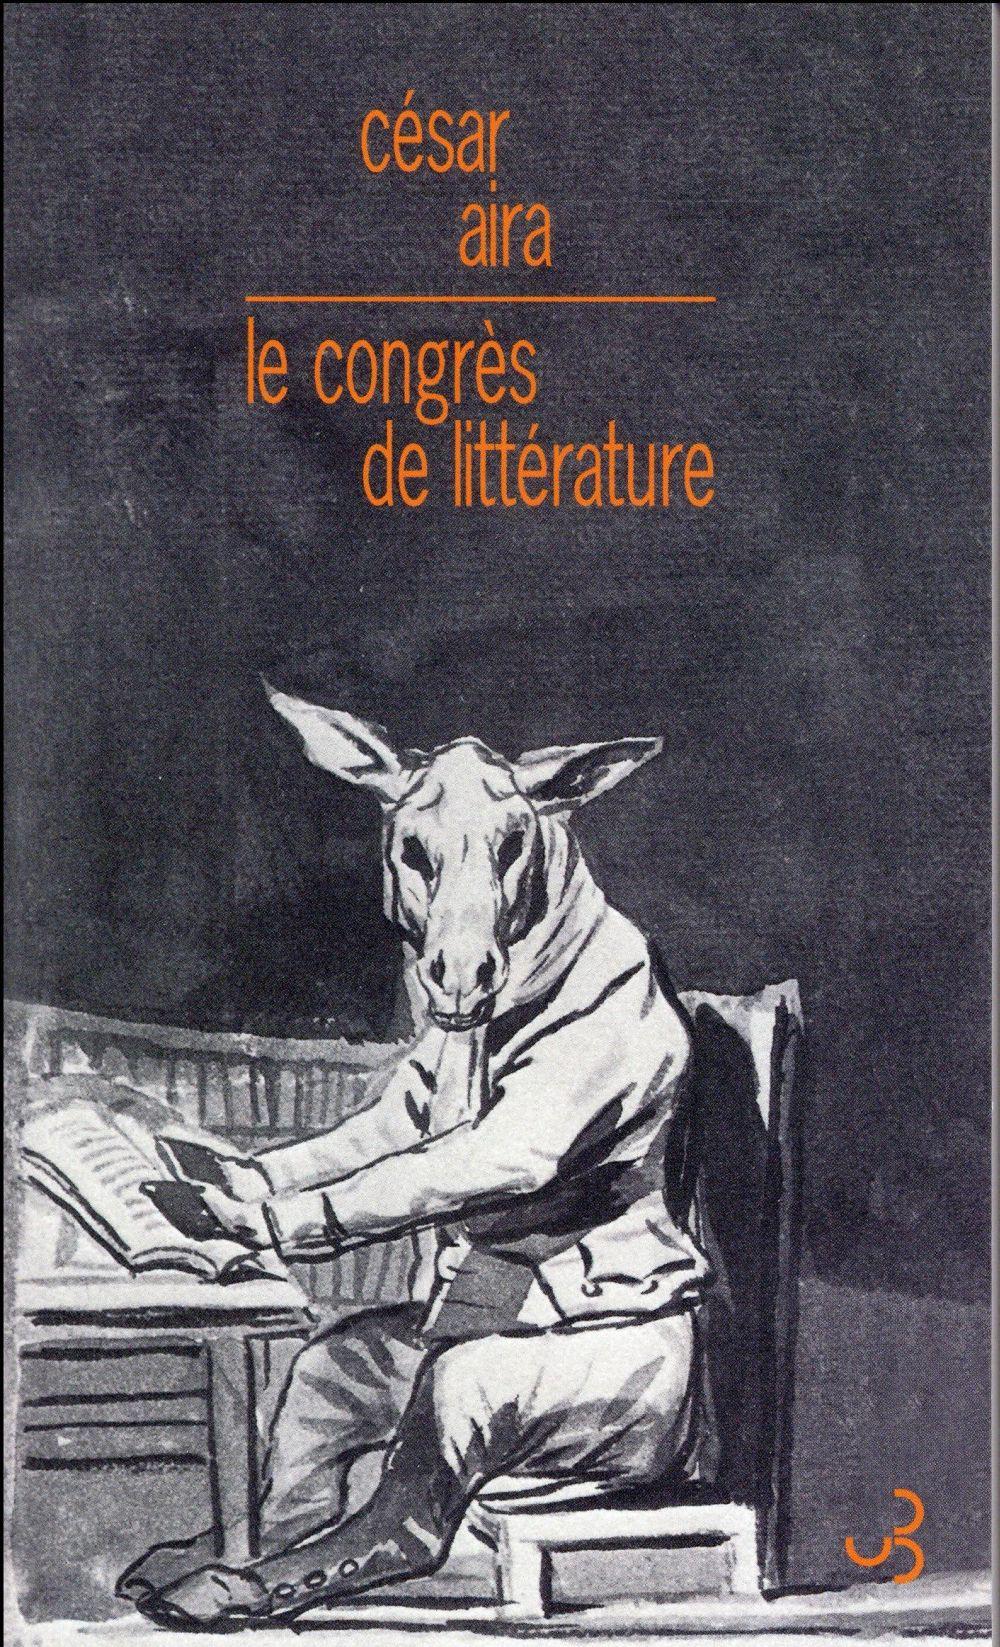 LE CONGRES DE LITTERATURE